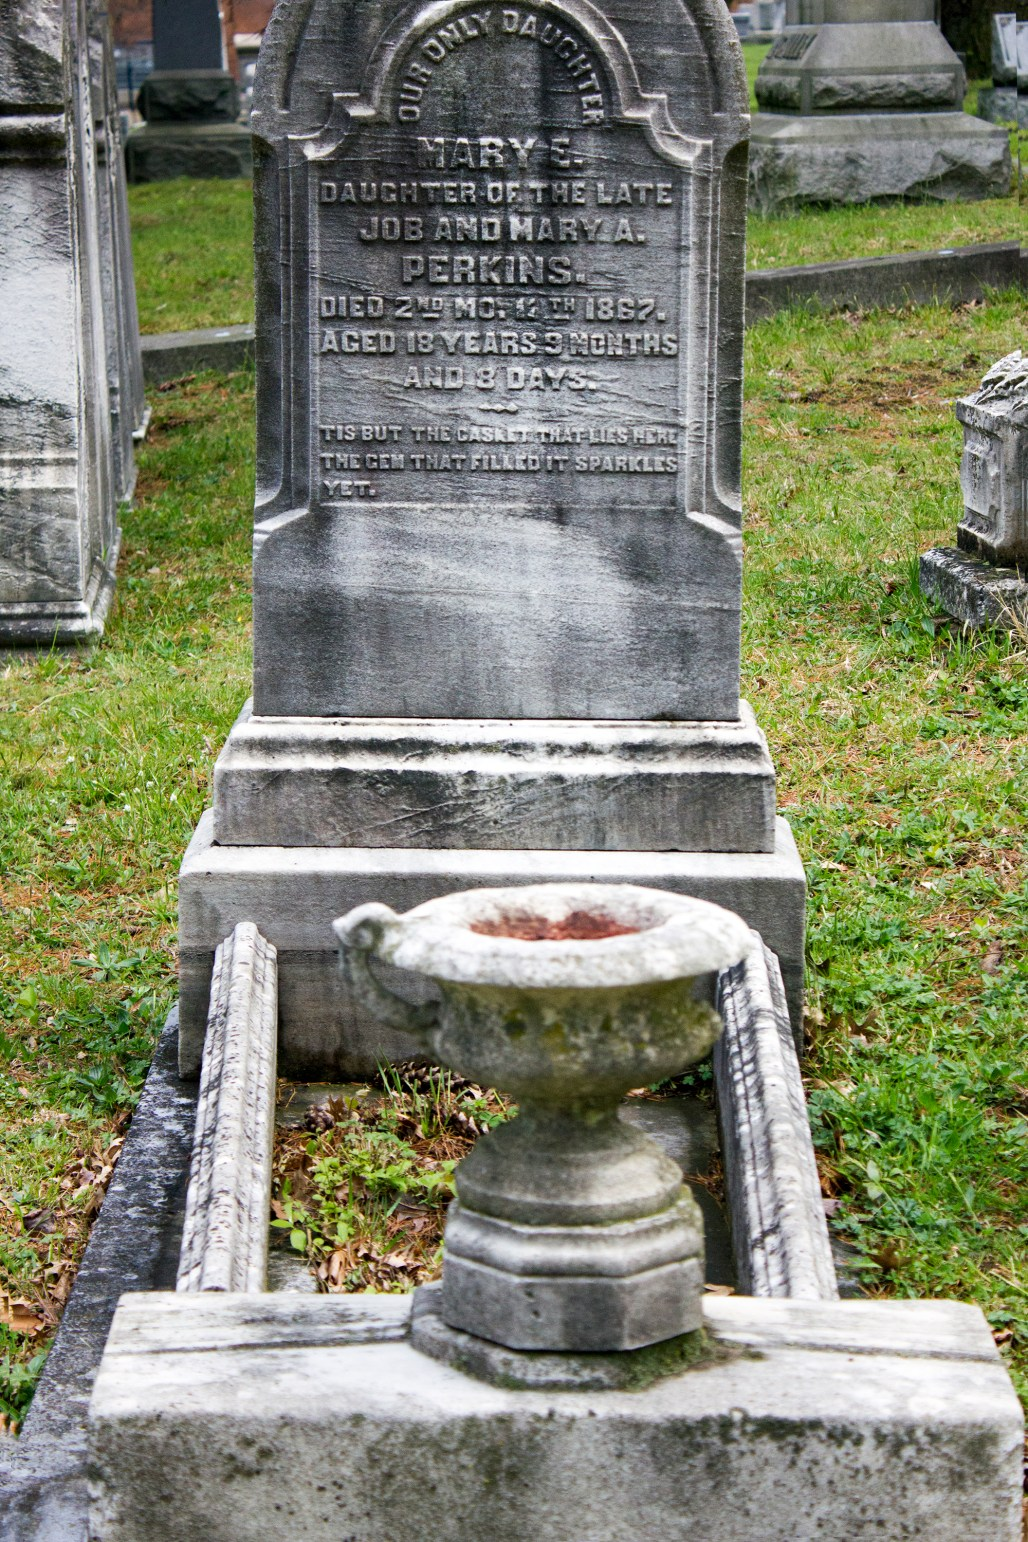 wilmington-brandywine-historical-cemetary-floral-plot